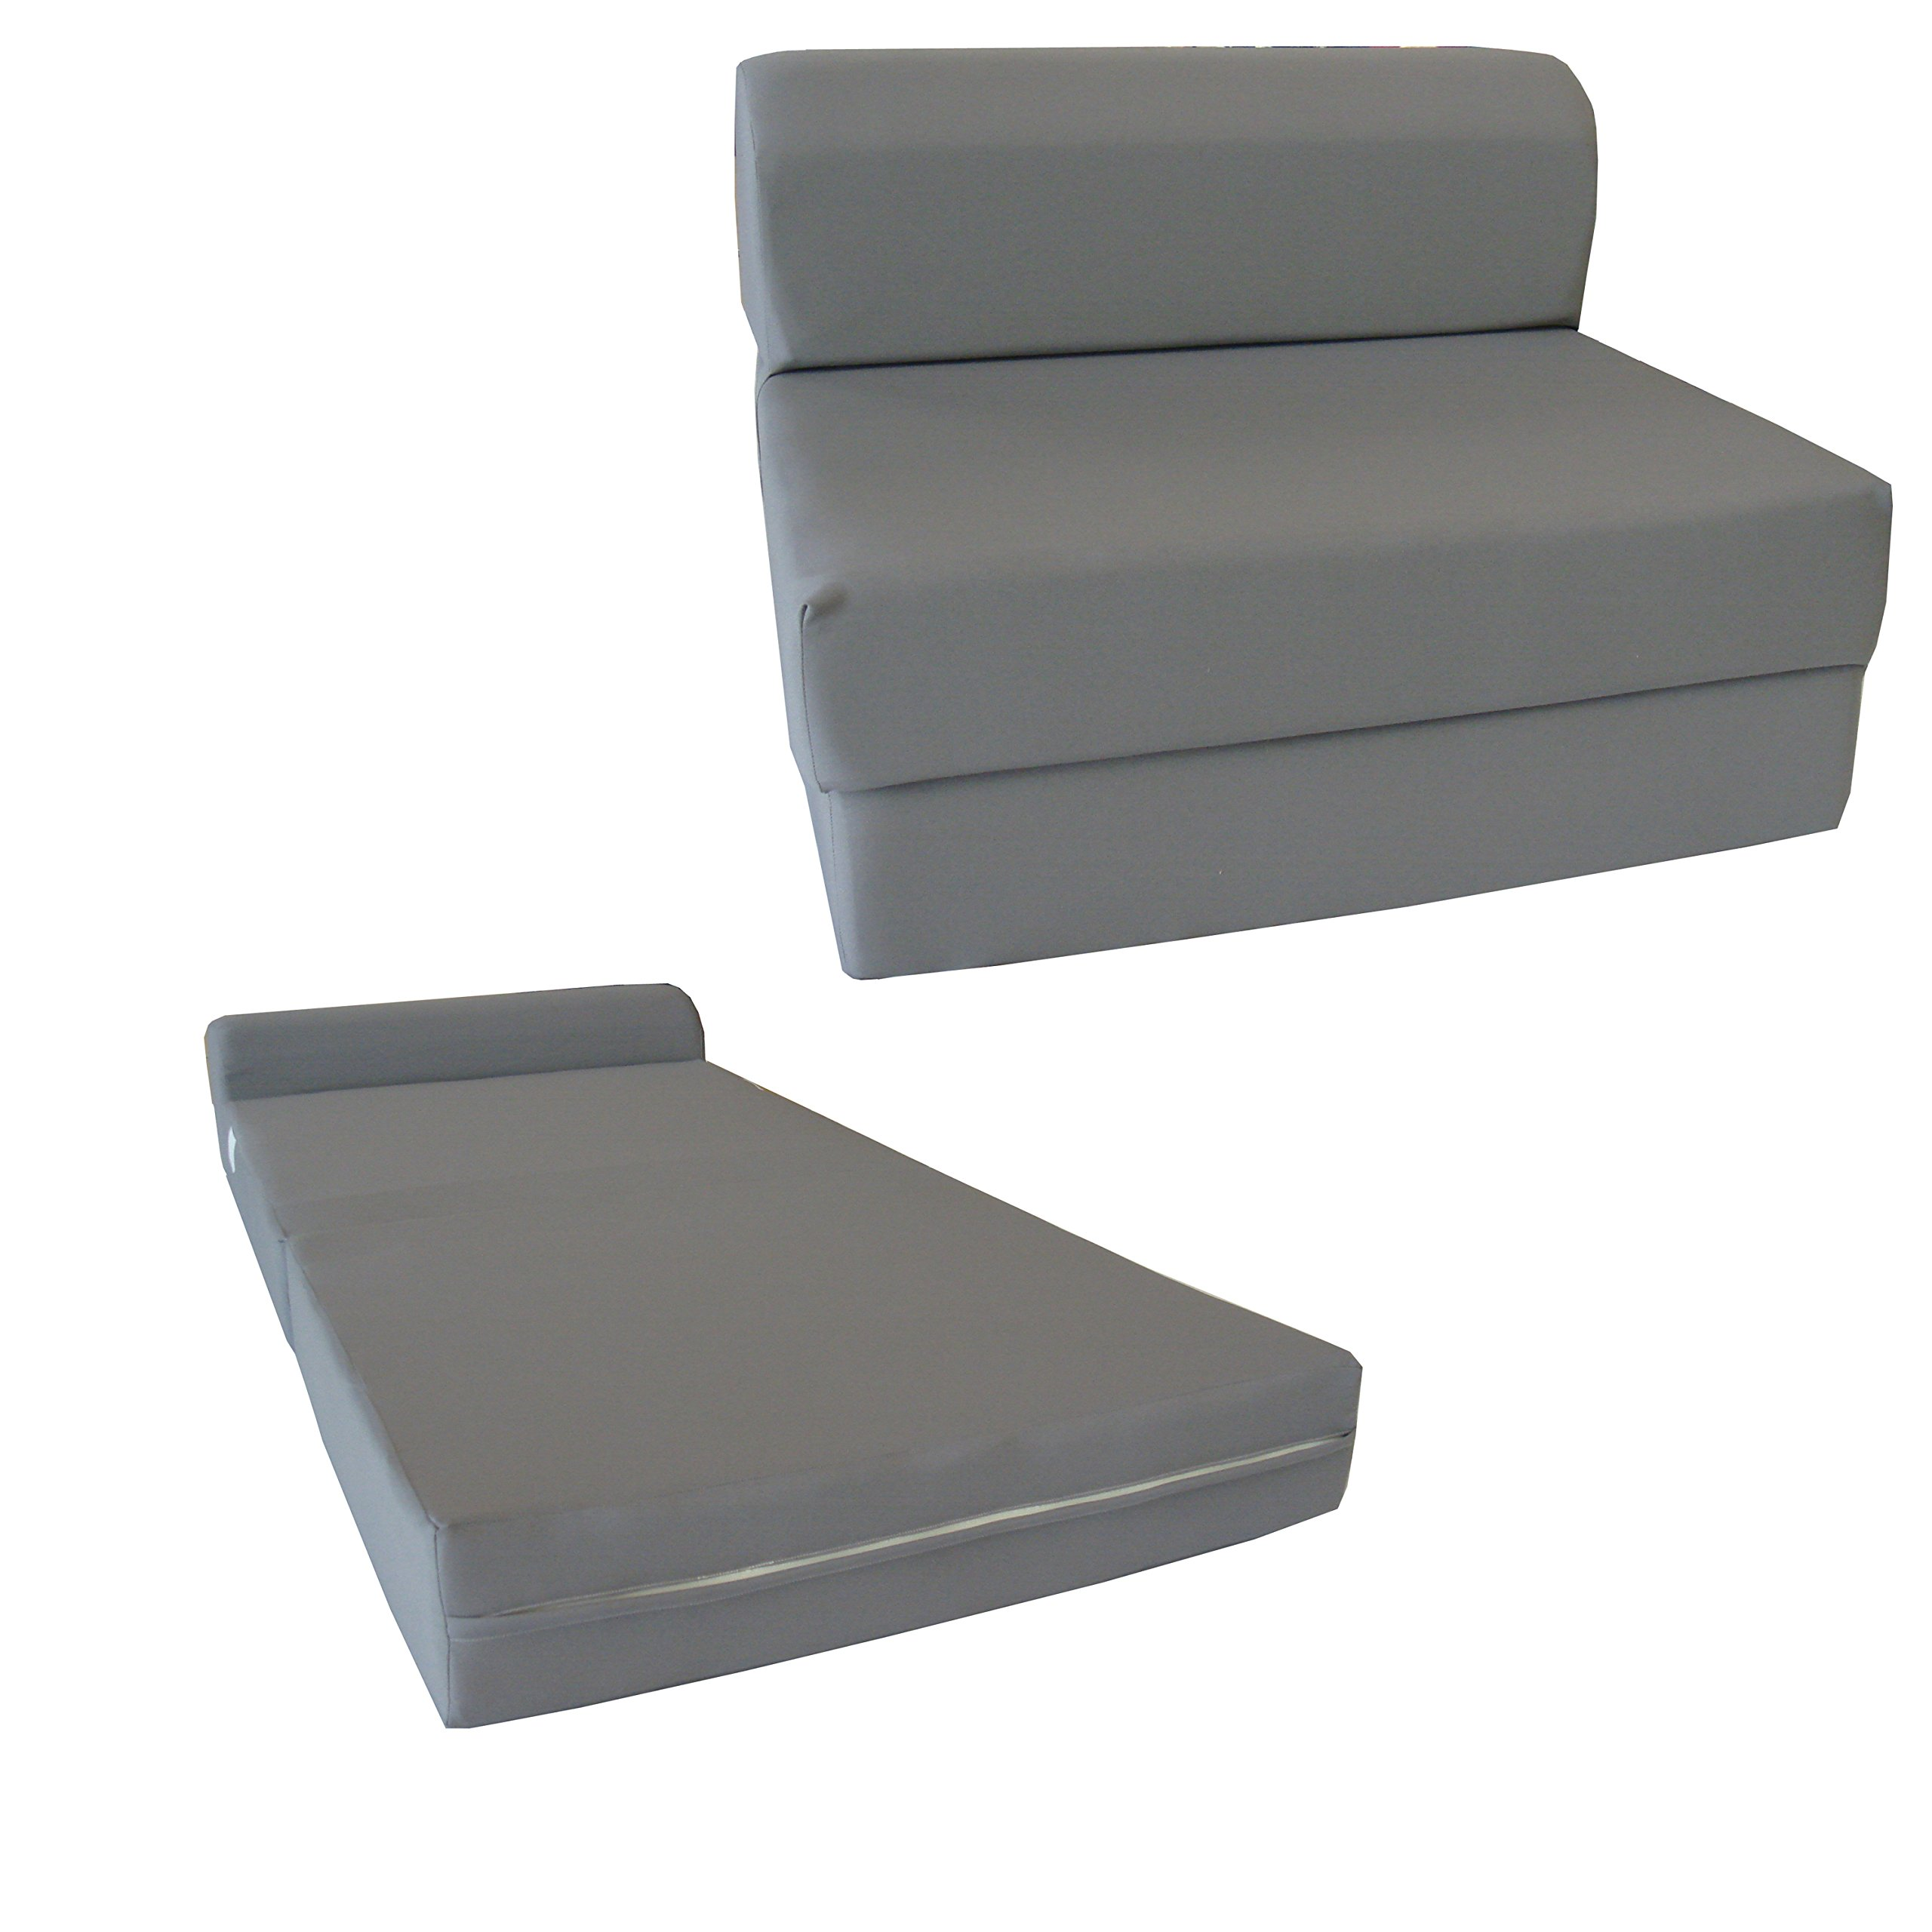 D&D Futon Furniture Gray Sleeper Chair Folding Foam Bed 6 x 48 x 72 inches, Studio Guest Beds, Sofa. by D&D Futon Furniture